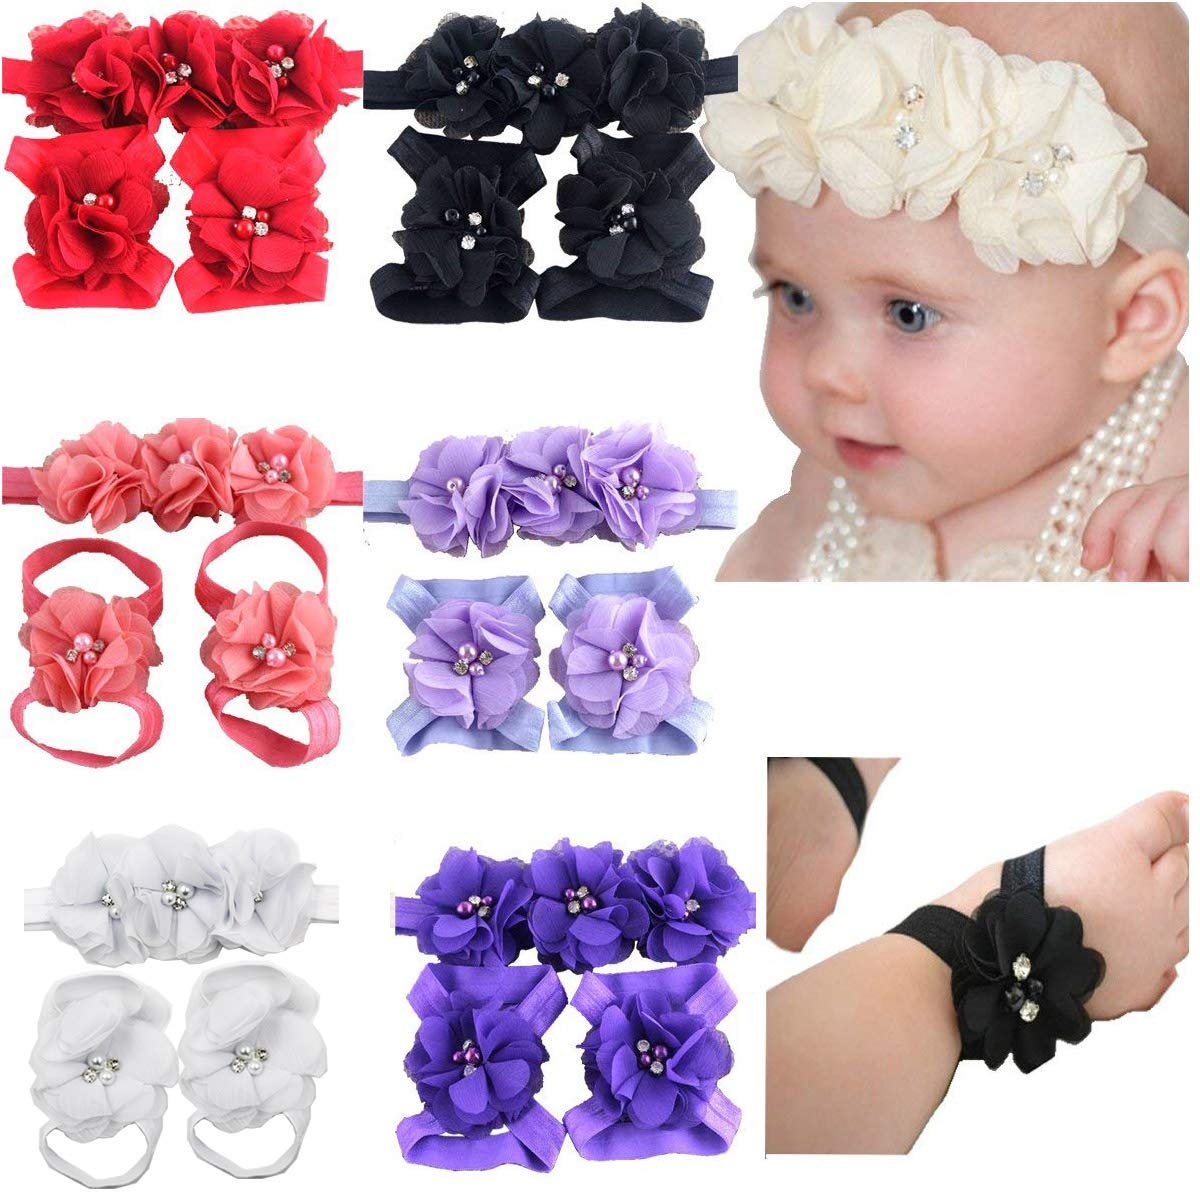 6 Colors Manufacturer OFFicial shop Baby Max 54% OFF Girl Flower Headbands Sandals Barefoot Ha Set